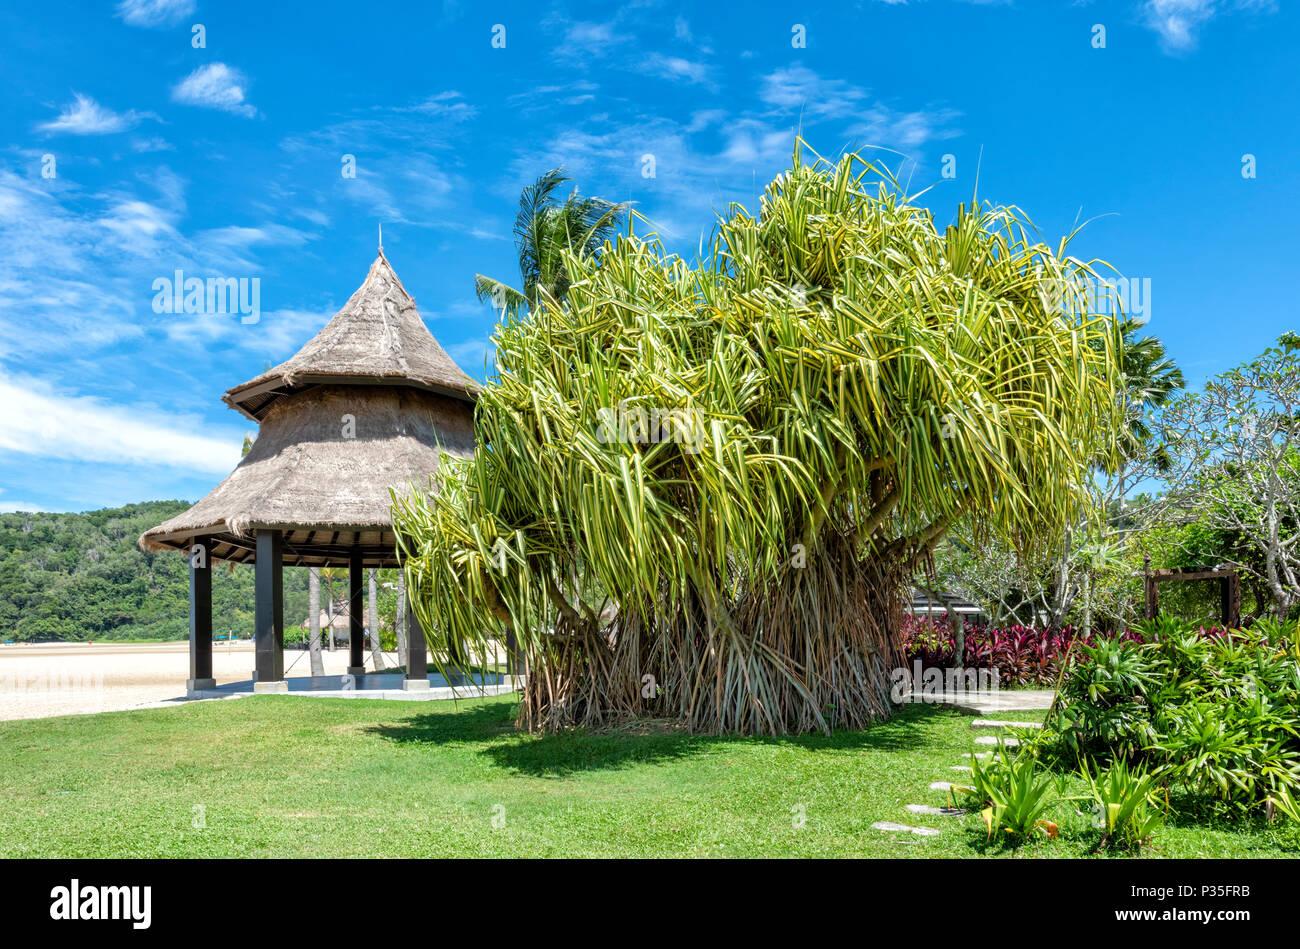 Beach front gazebo at the Shangri La Rasa Ria Hotel and Resort in Kota Kinabalu, Borneo, Malaysia - Stock Image